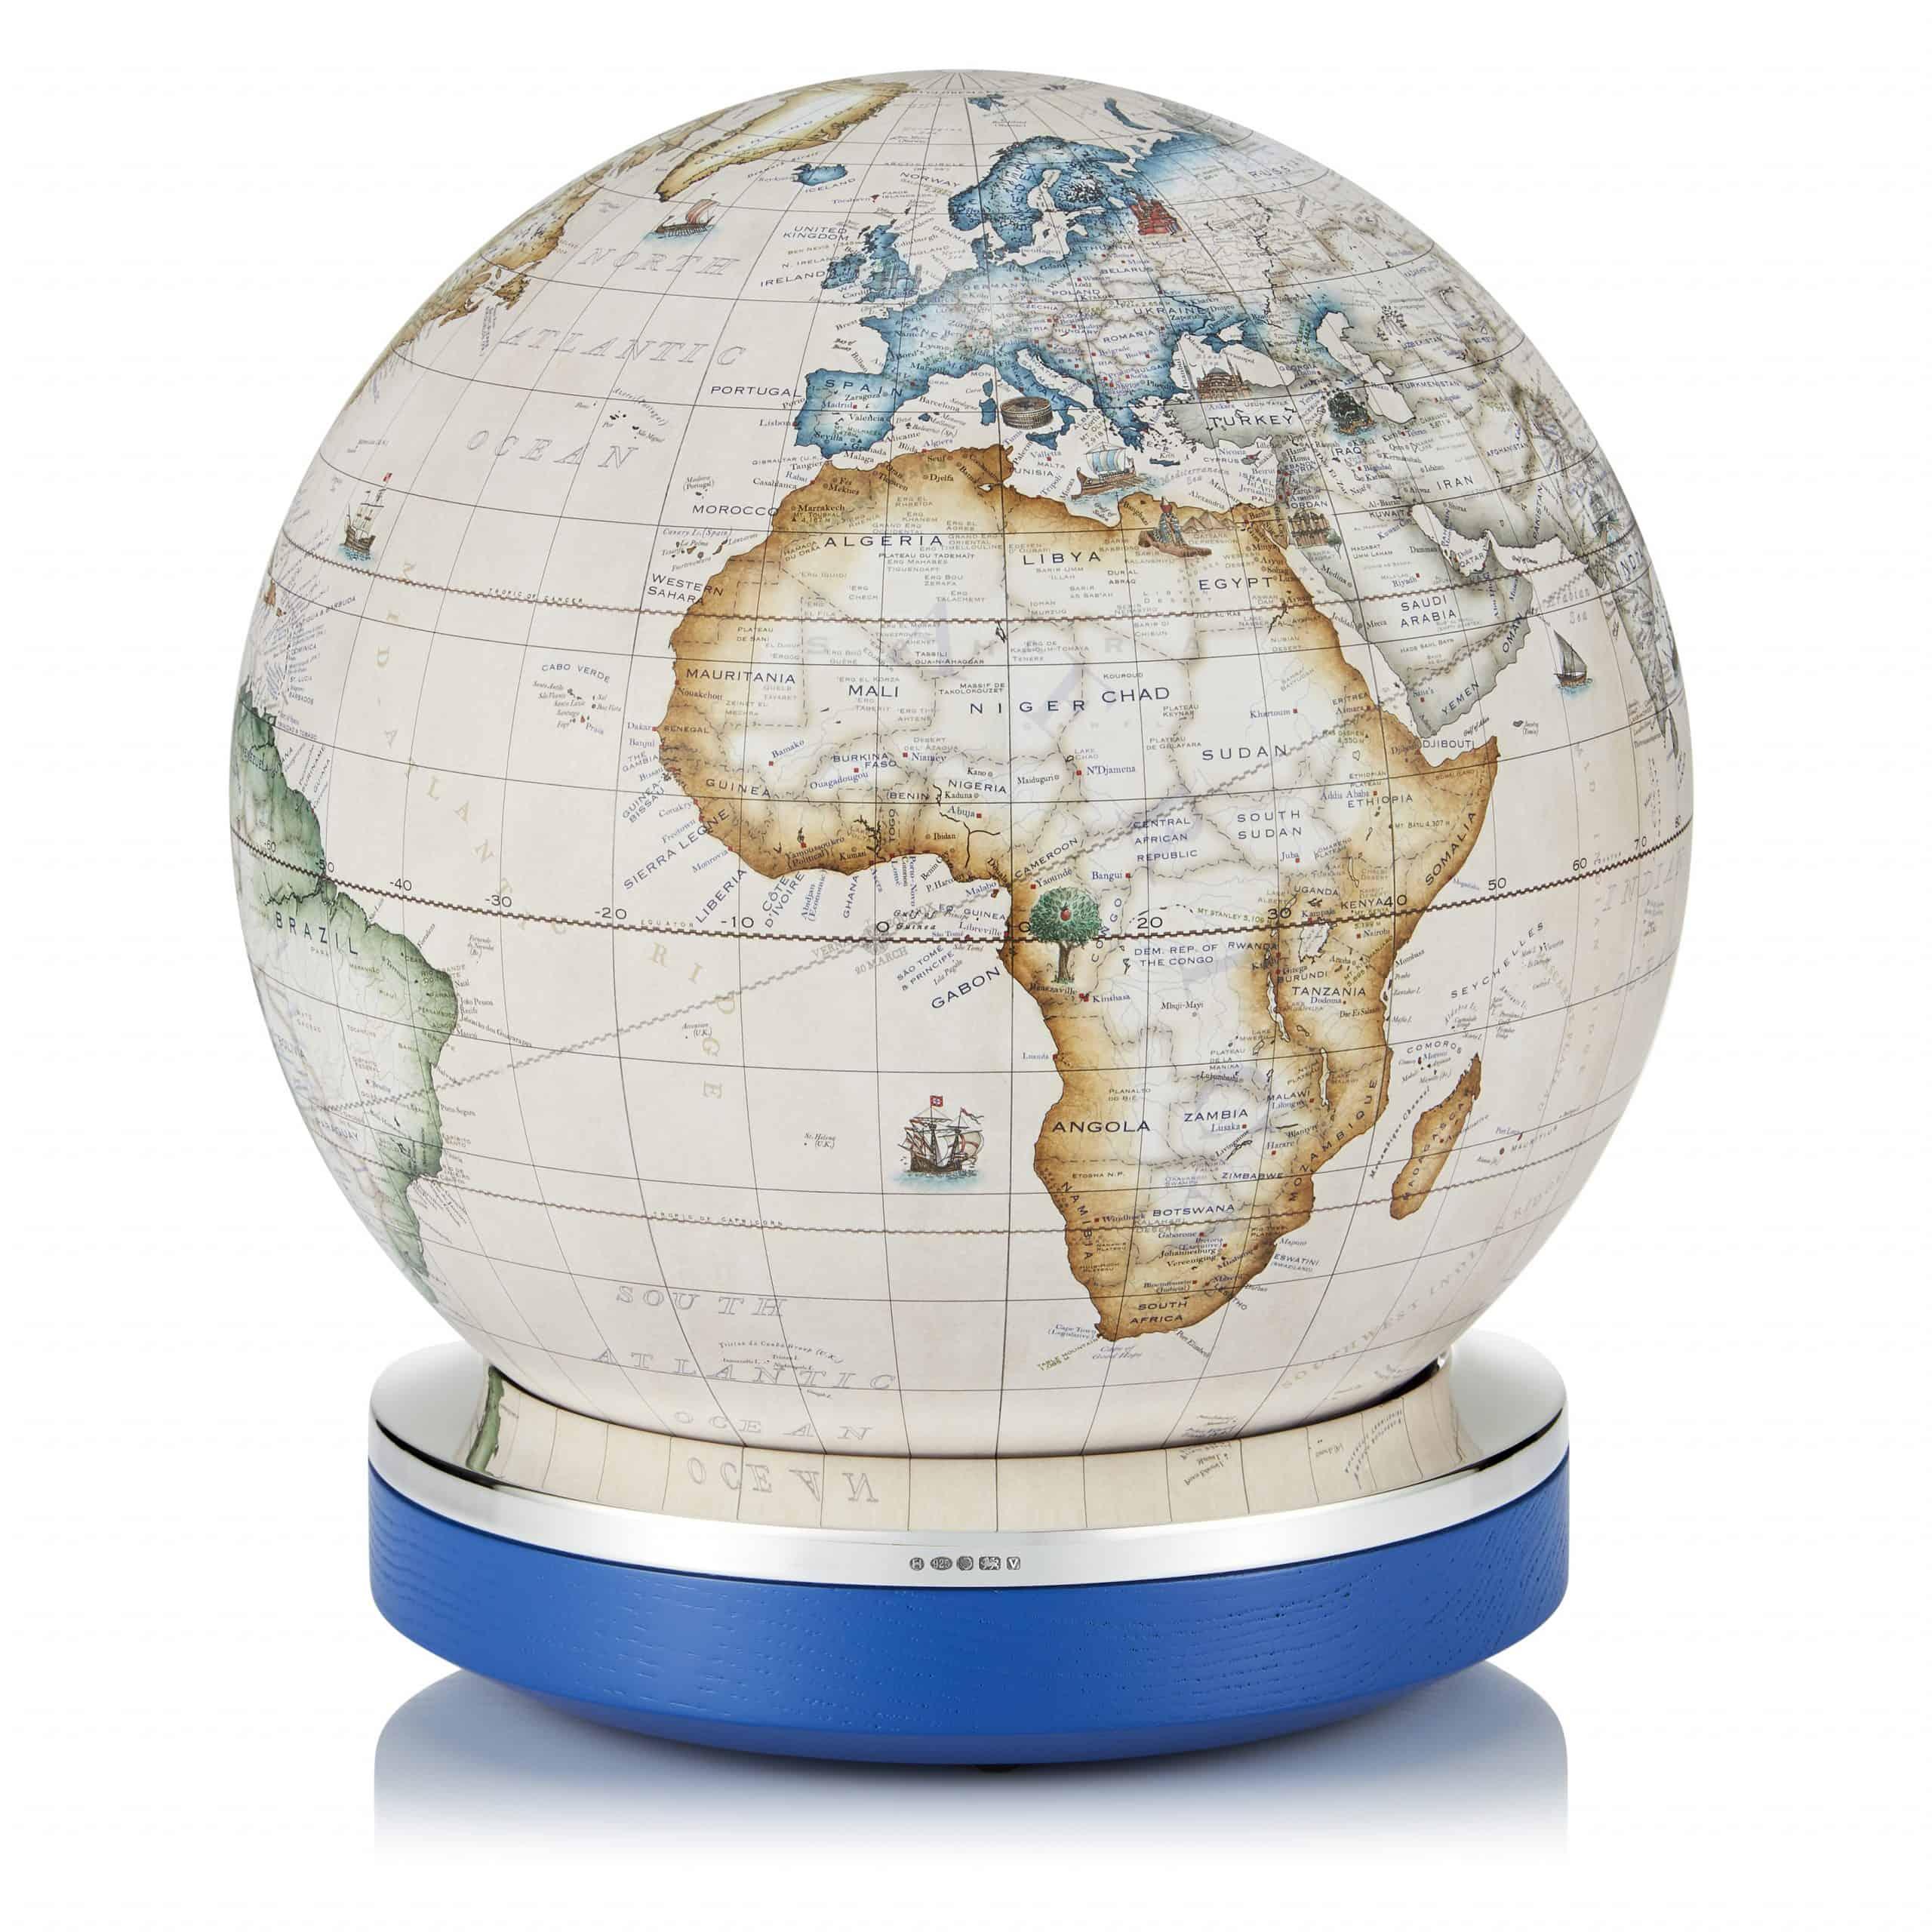 The Civilisations Globe